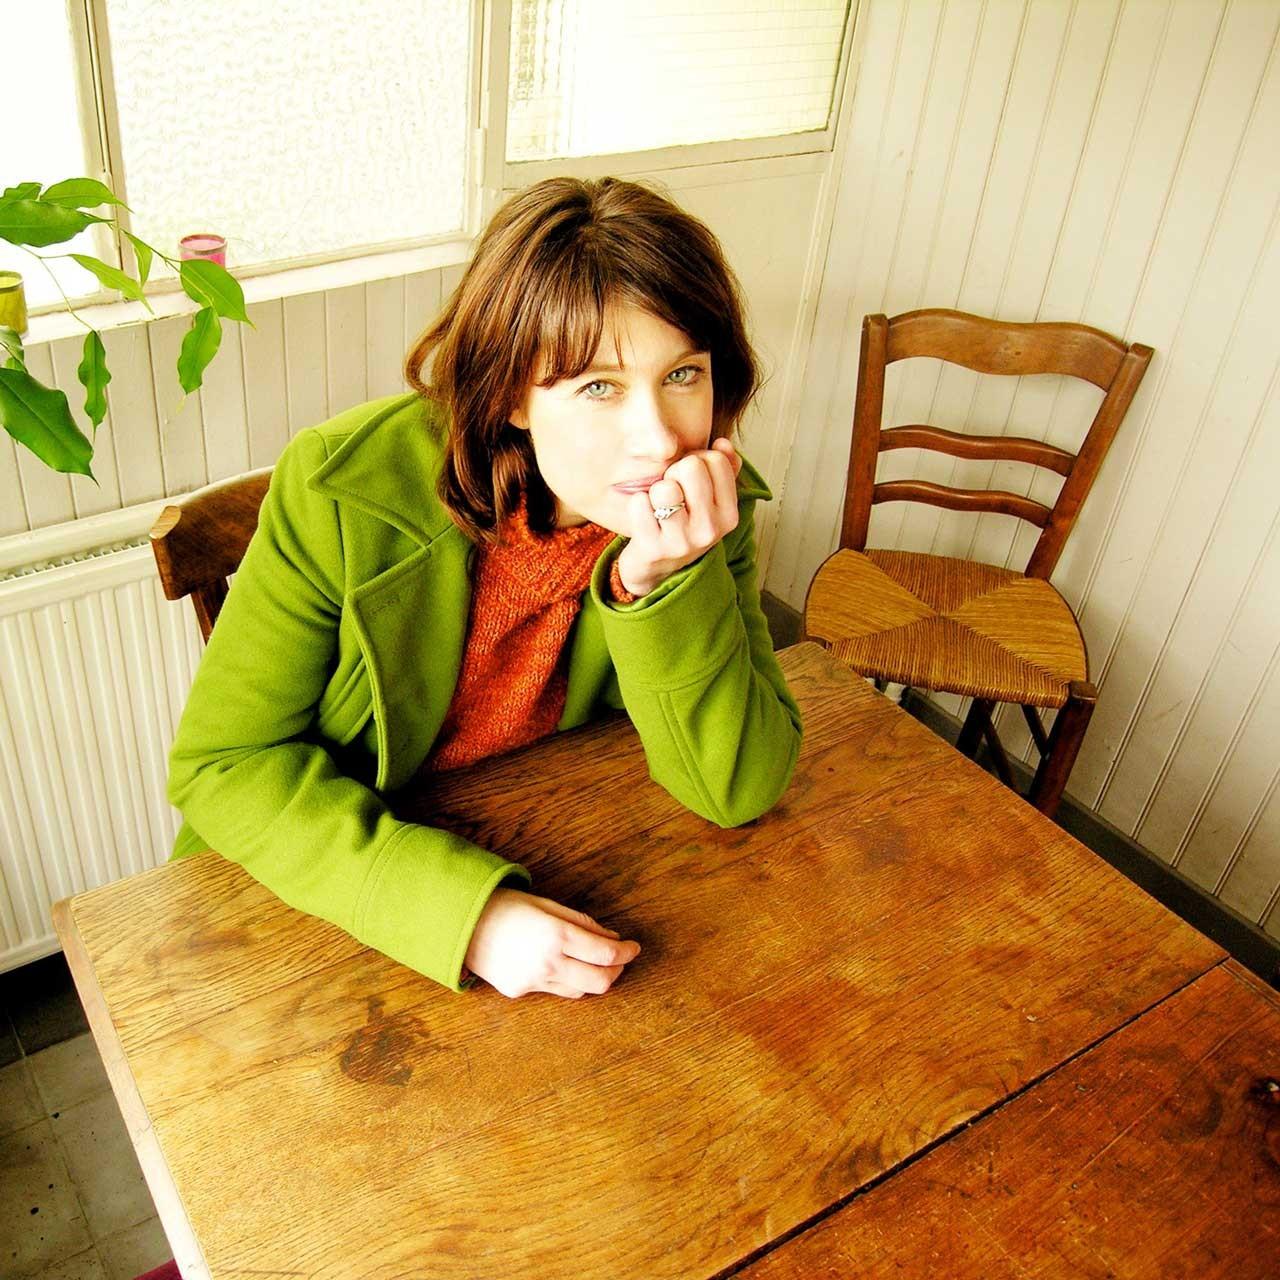 Laure-Maud_photographe_portrait_14_Nicole-Pache_4